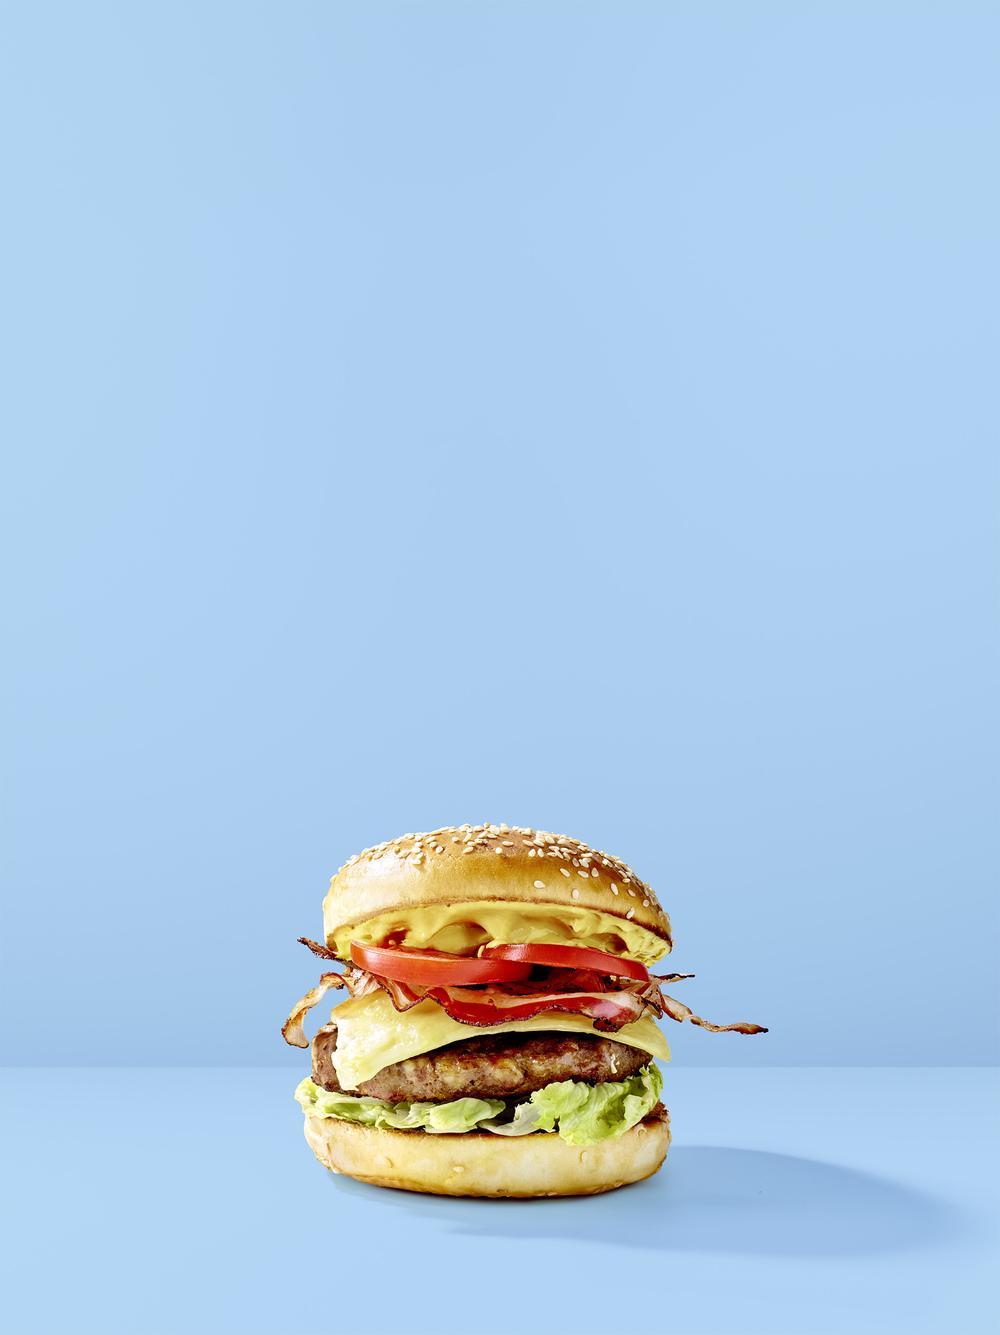 Hauptsache_Burger_01.jpg